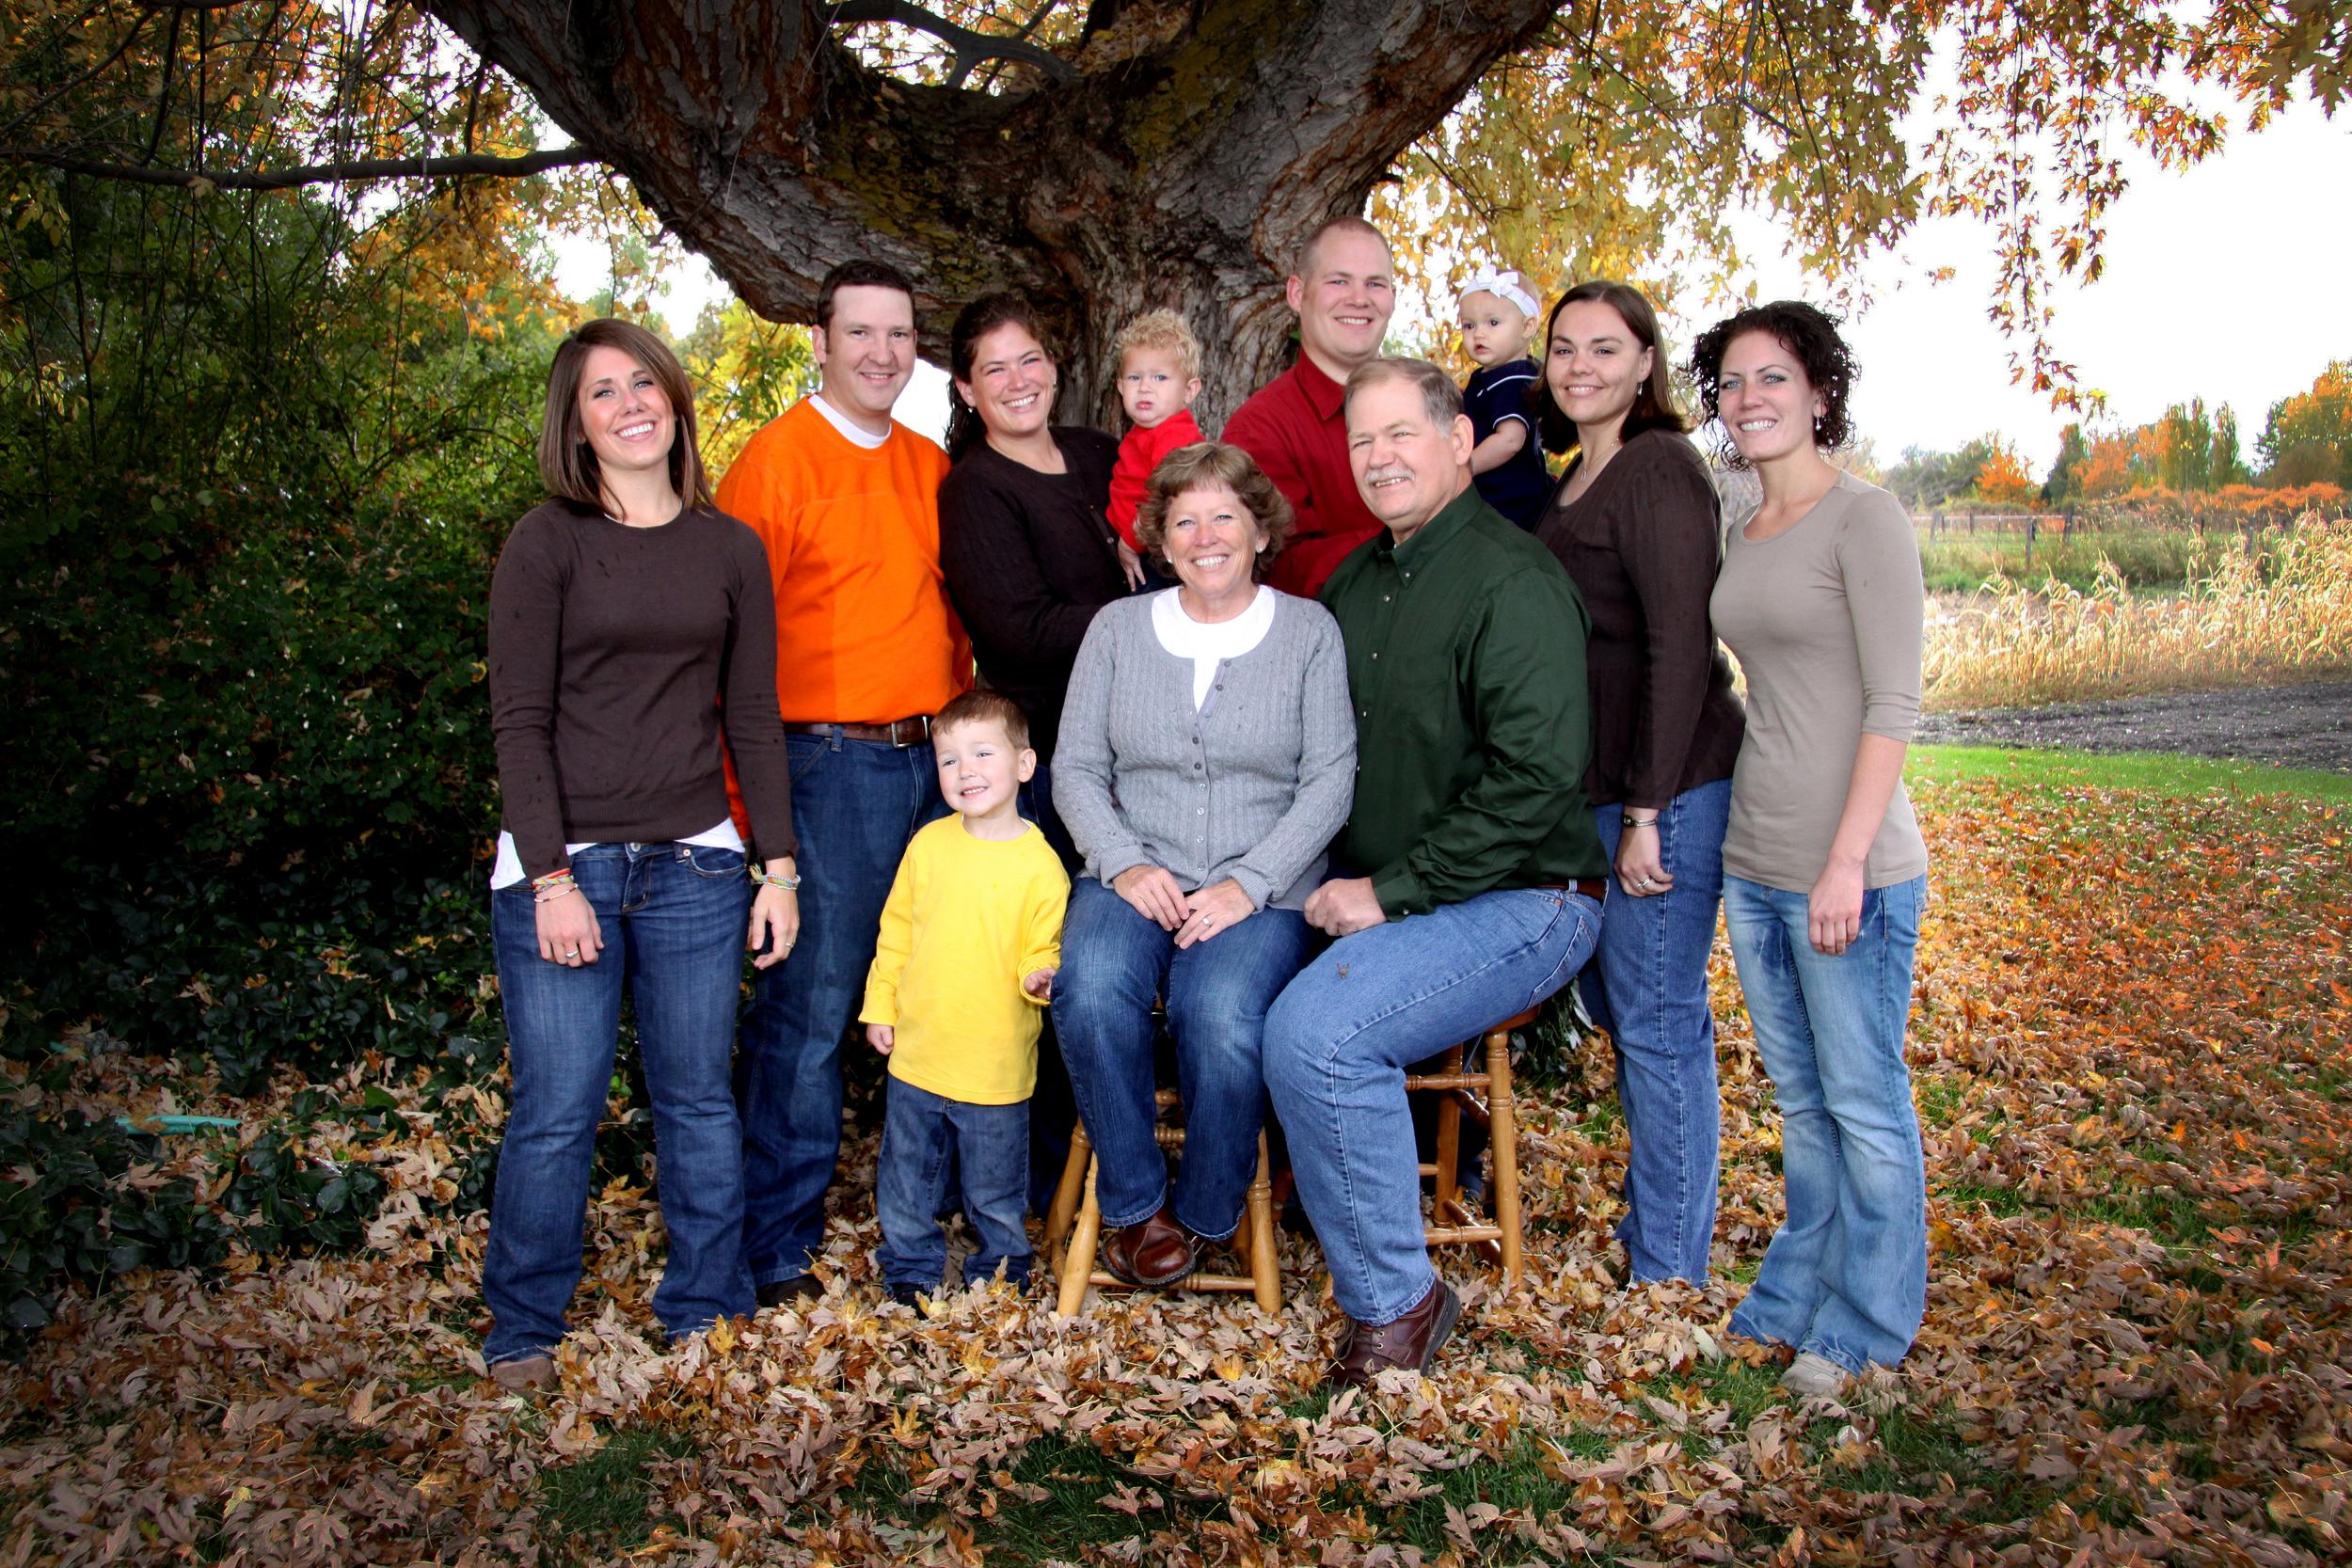 Bountiful Portrait studio Photography, Family Portrait in West Bountiful Utah